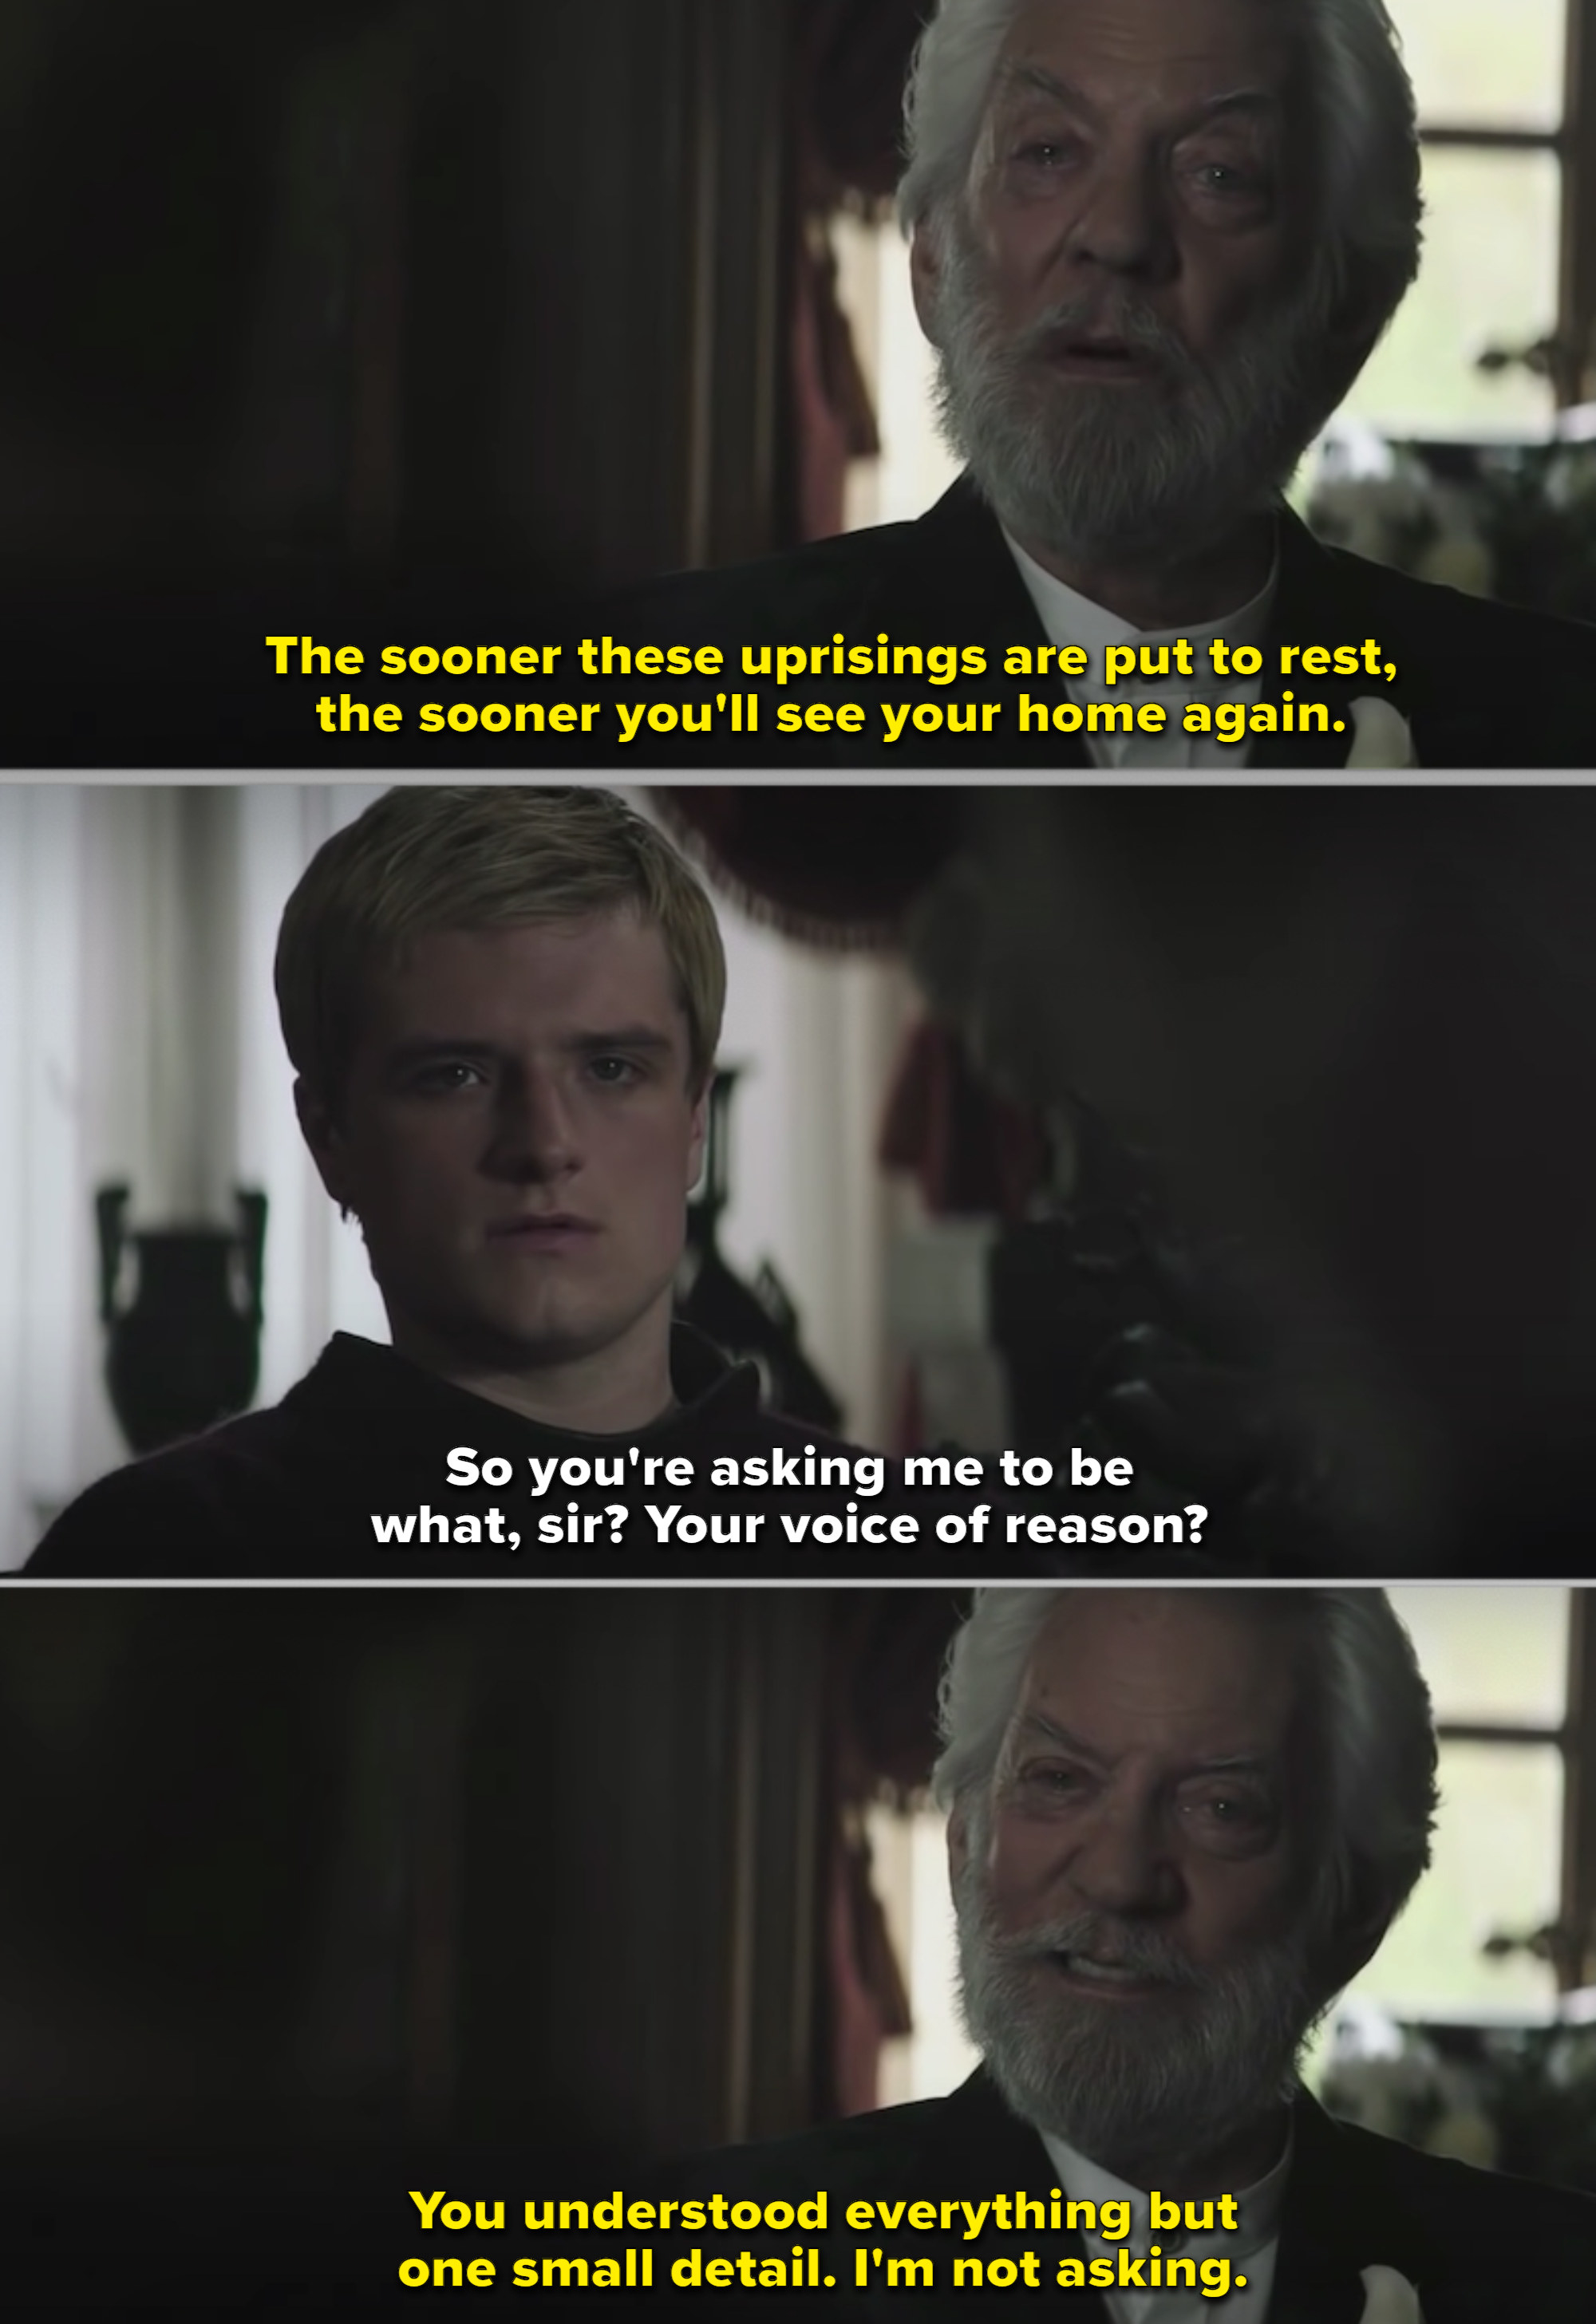 President Snow and Peeta talking in his house